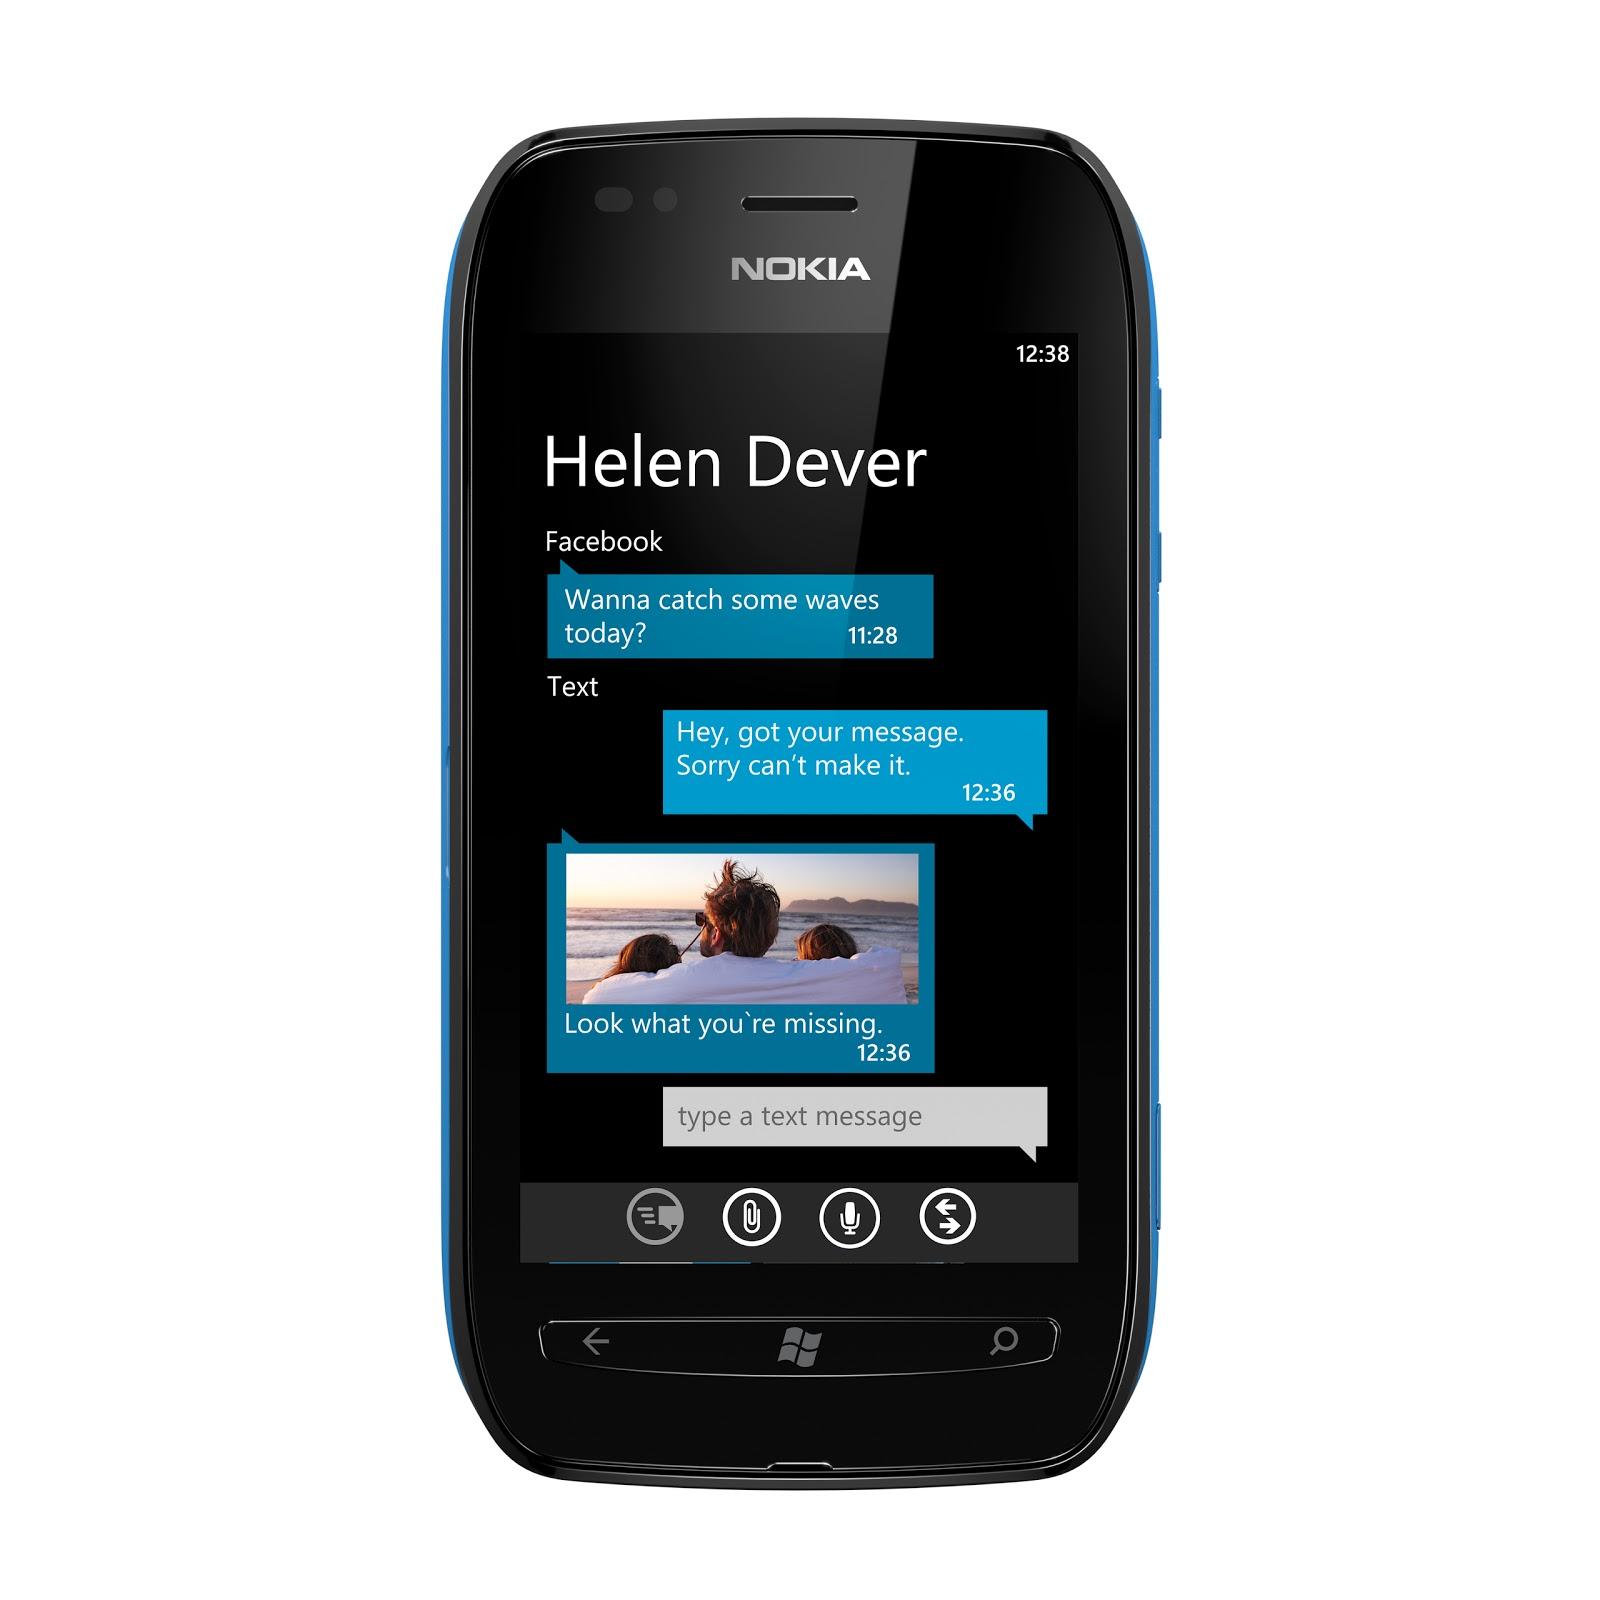 Nokia Lumia 710,Nokia,Lumia 710,Lumia 710 fiche technique,Lumia 710 tests,Lumia 710 jeux,Lumia 710 applications,Lumia 710 themes,Lumia software,Nokia Lumia 710 telecharger,Nokia Lumia 710 prix,Nokia Lumia 710 Specifications,Nokia Lumia 710 downloads,Nokia Lumia 710 caracteristiques,Nokia Lumia 710 accessoires,Nokia Lumia 710 Galerie,Nokia Lumia 710 mobile,Nokia Lumia 710 Ovi Store,Nokia Lumia 710 Logiciels,